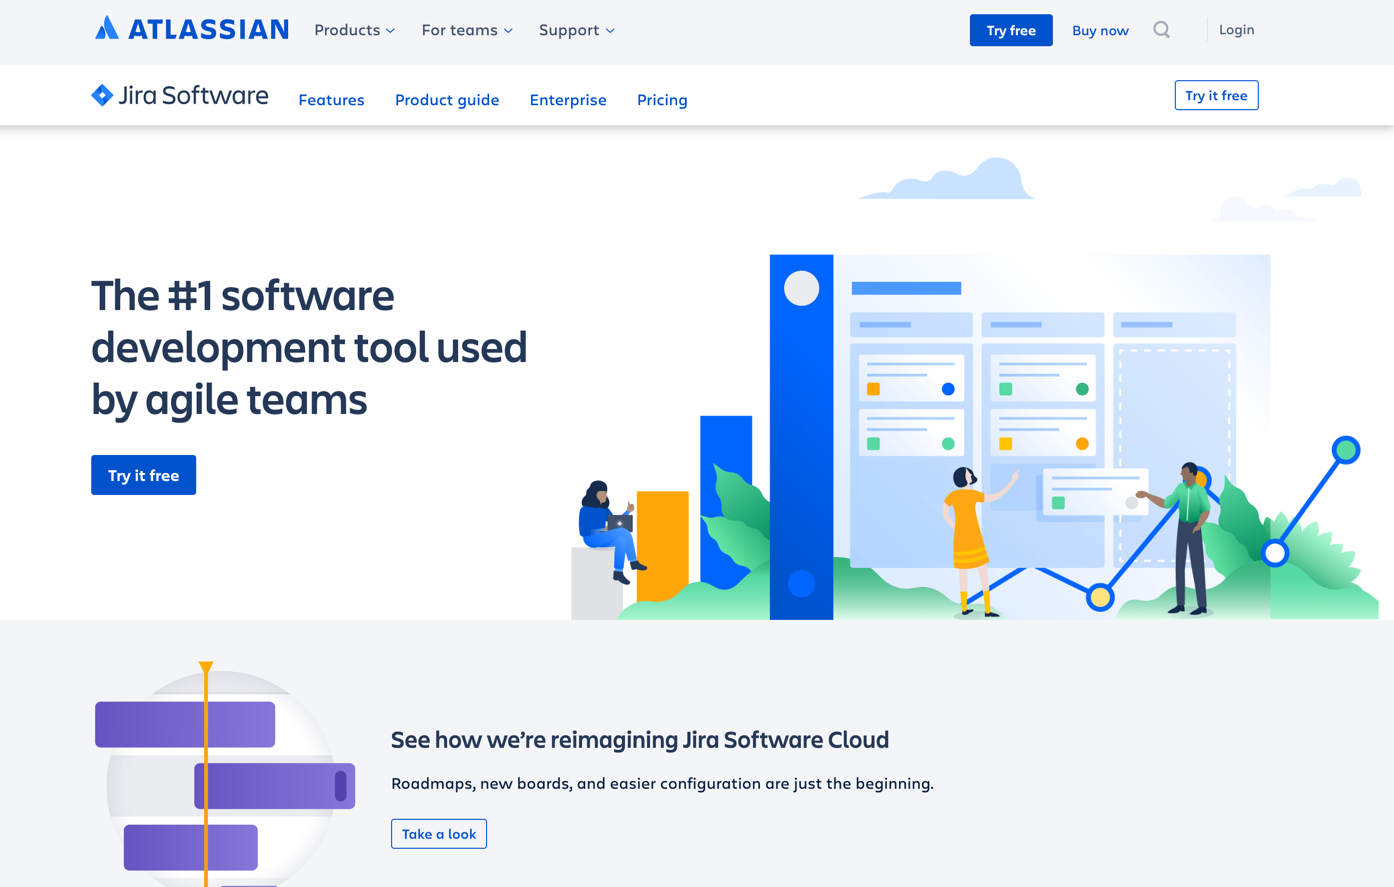 atlassian homepage